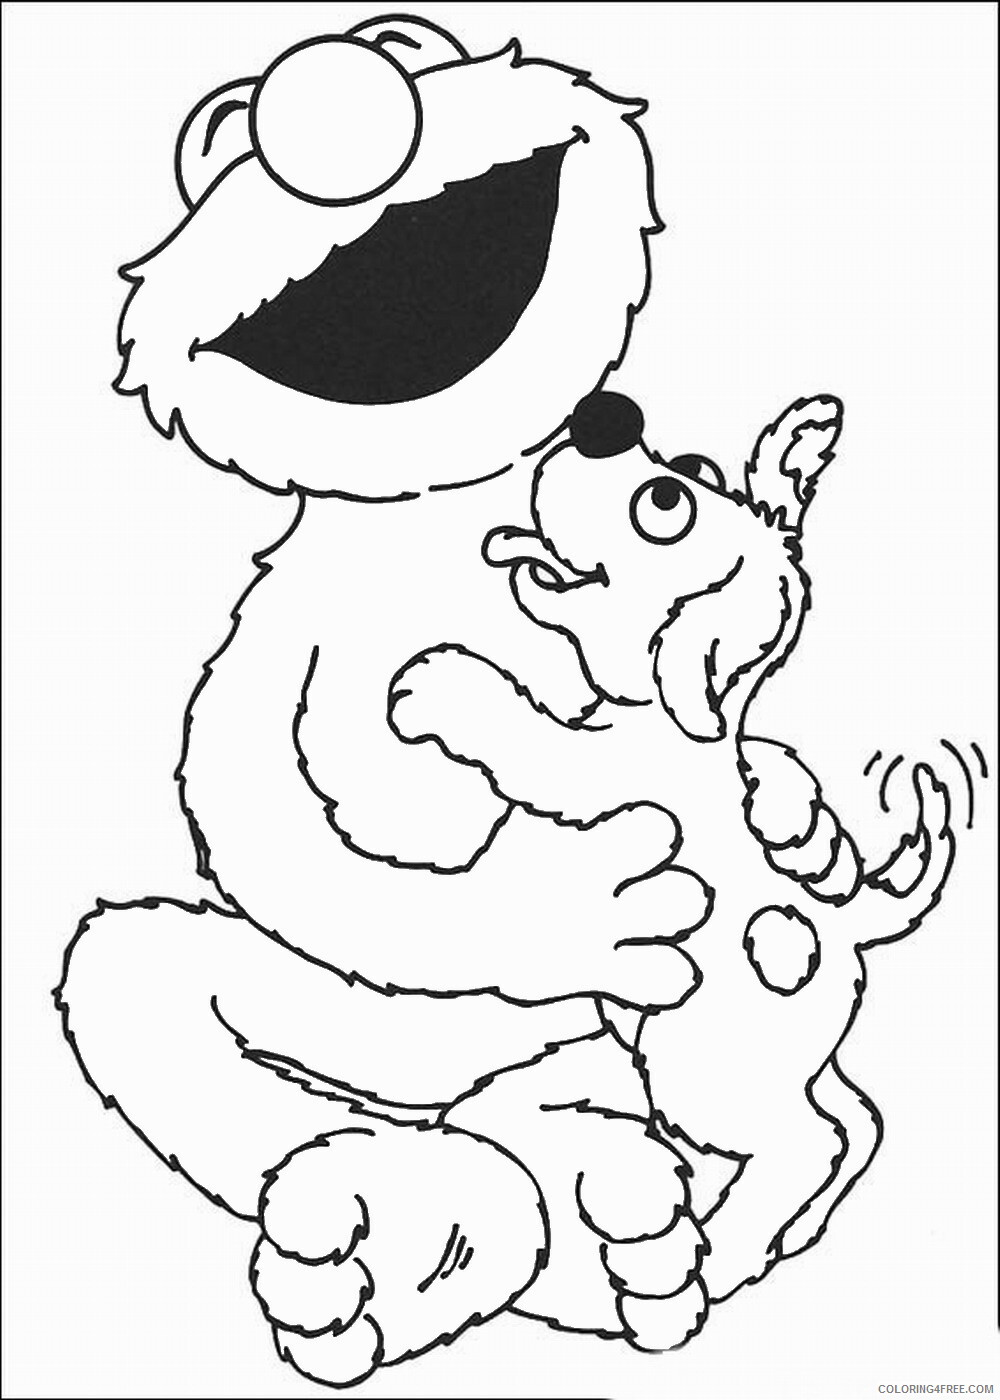 Sesame Street Coloring Pages TV Film sesame_16 Printable 2020 07371 Coloring4free